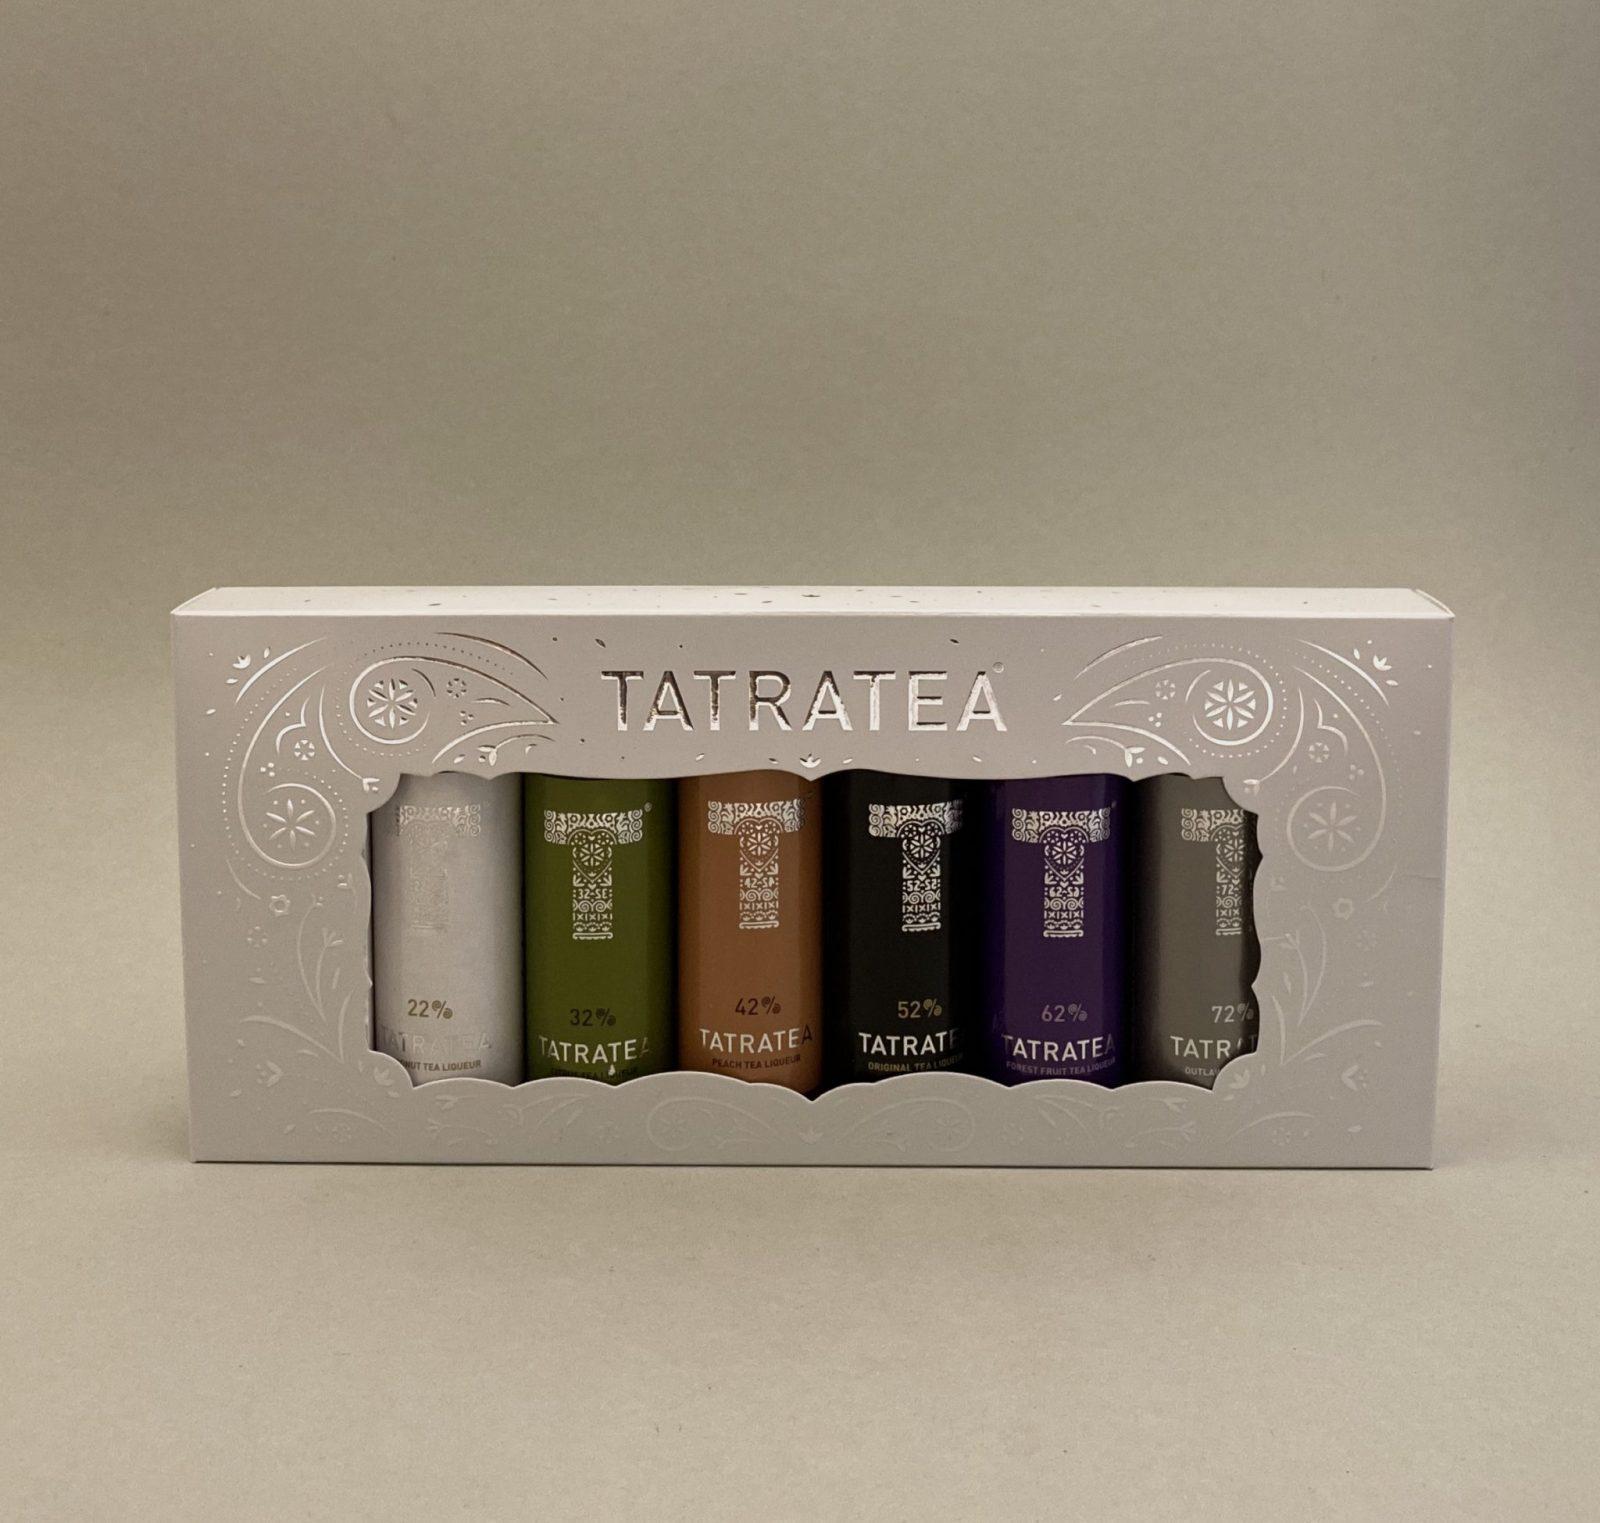 TATRATEA Mini Set 17 67% 6ks, Bottleshop Sunny wines slnecnice mesto, petrzalka, Tatratea, rozvoz alkoholu, eshop